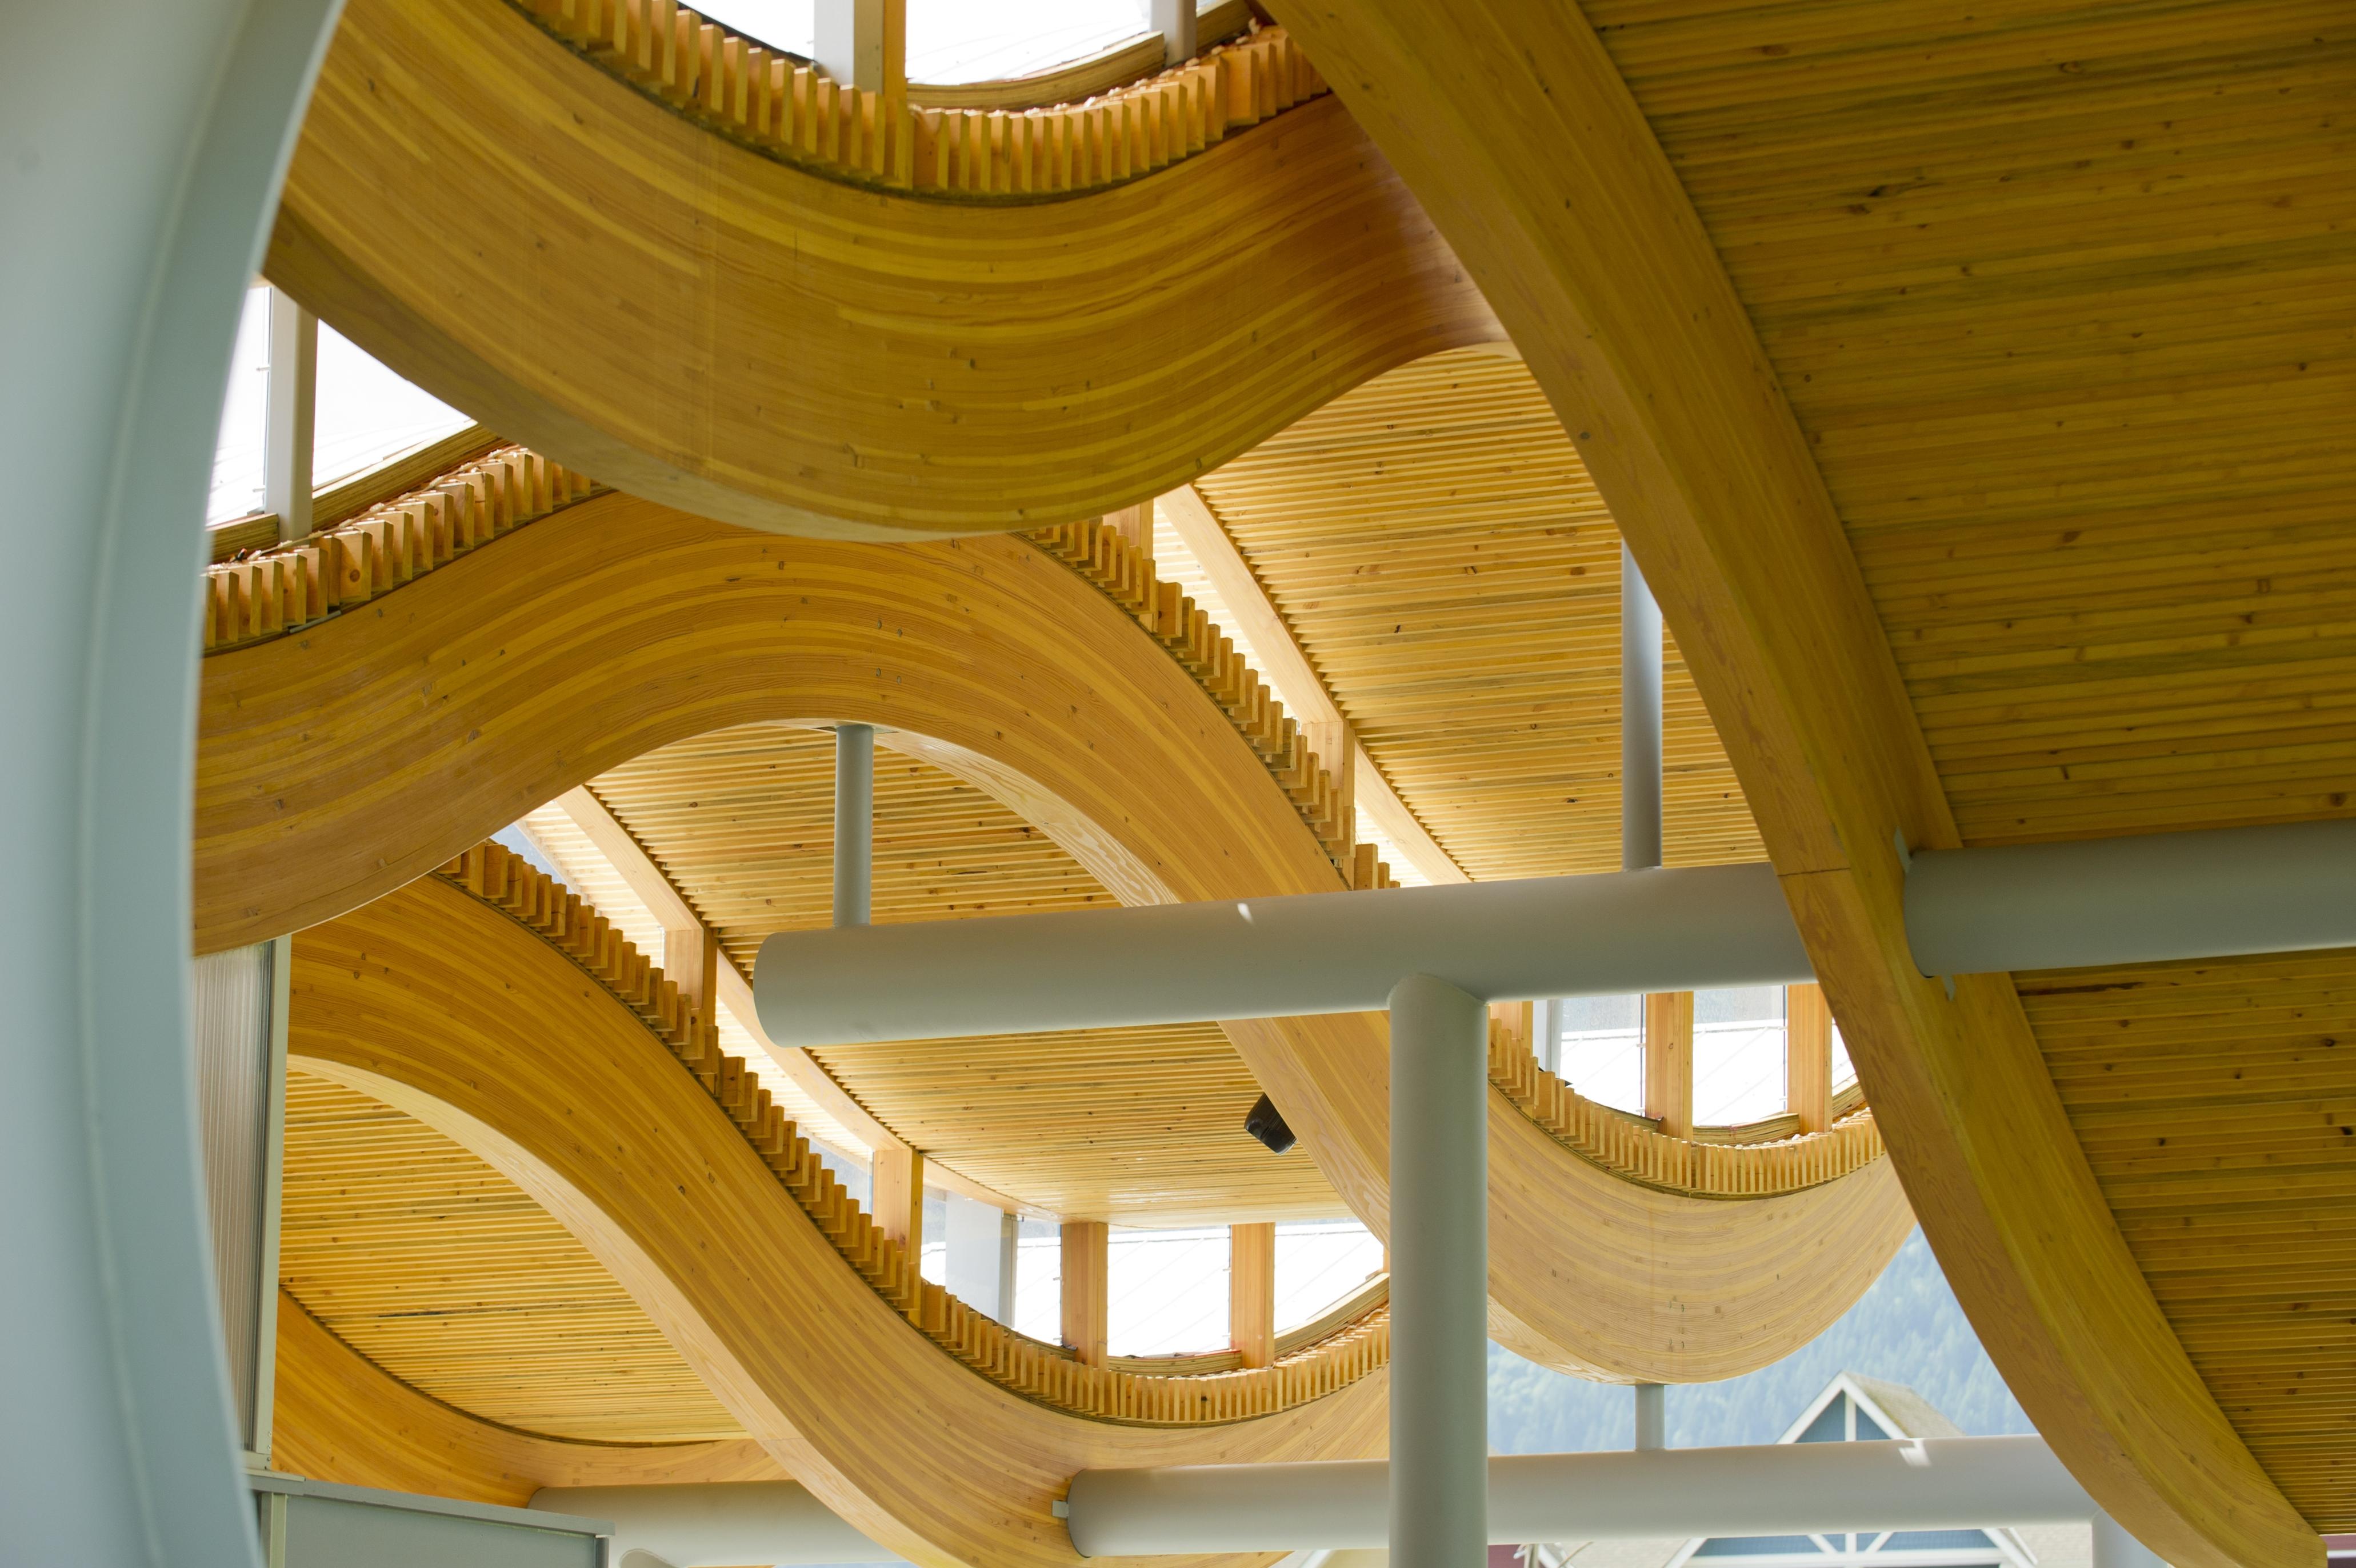 Formline Architecture